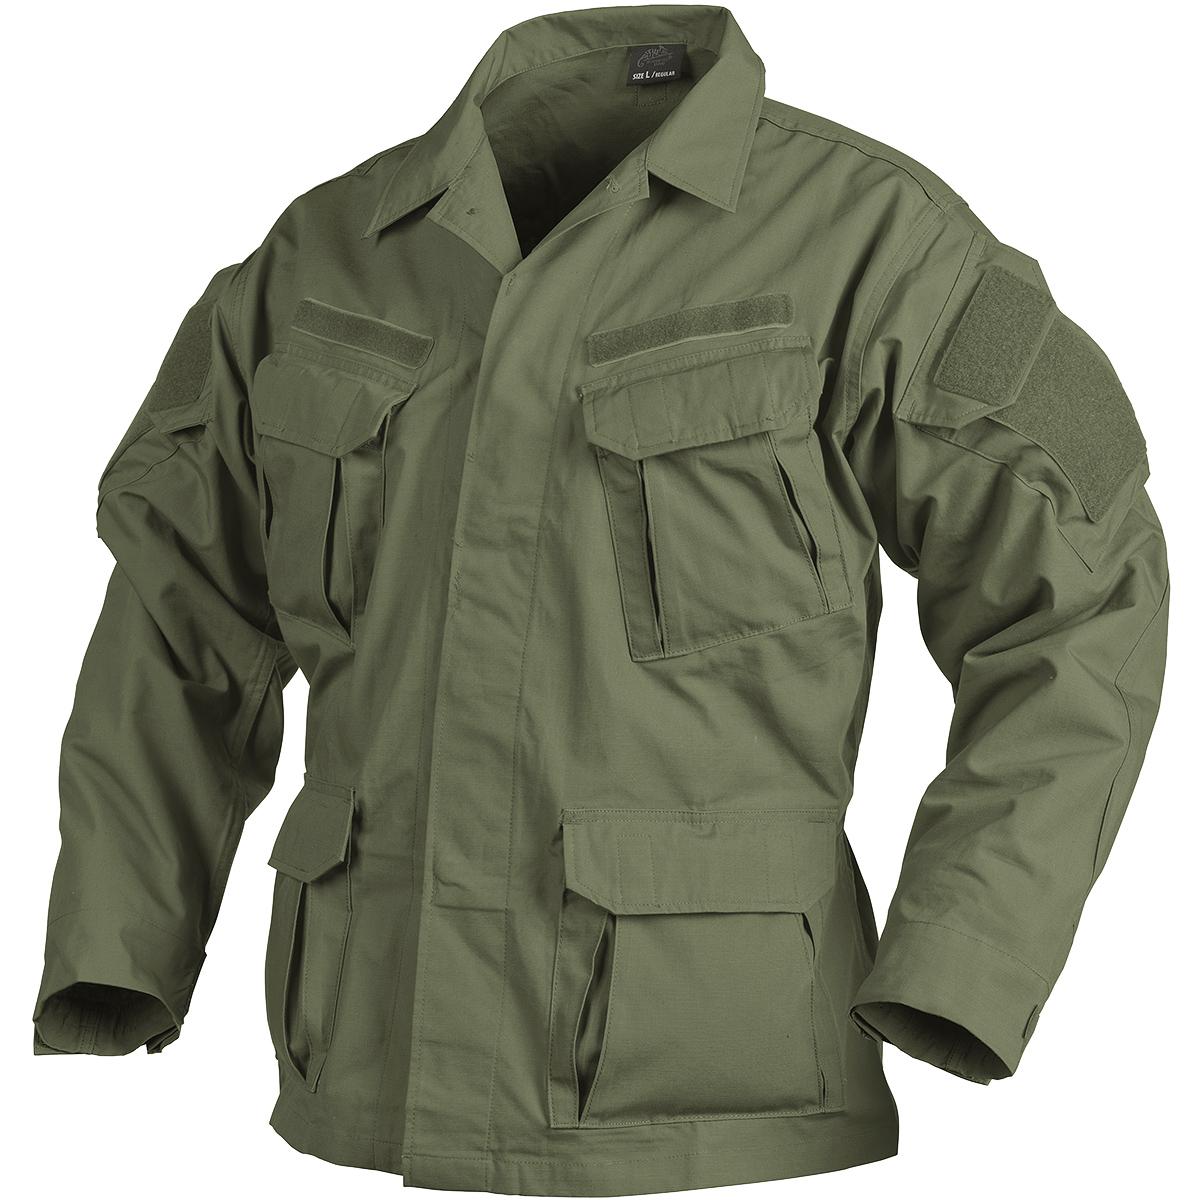 Helikon Sfu Next Military Cadet Uniform Shirt Mens Ripstop Jacket ...